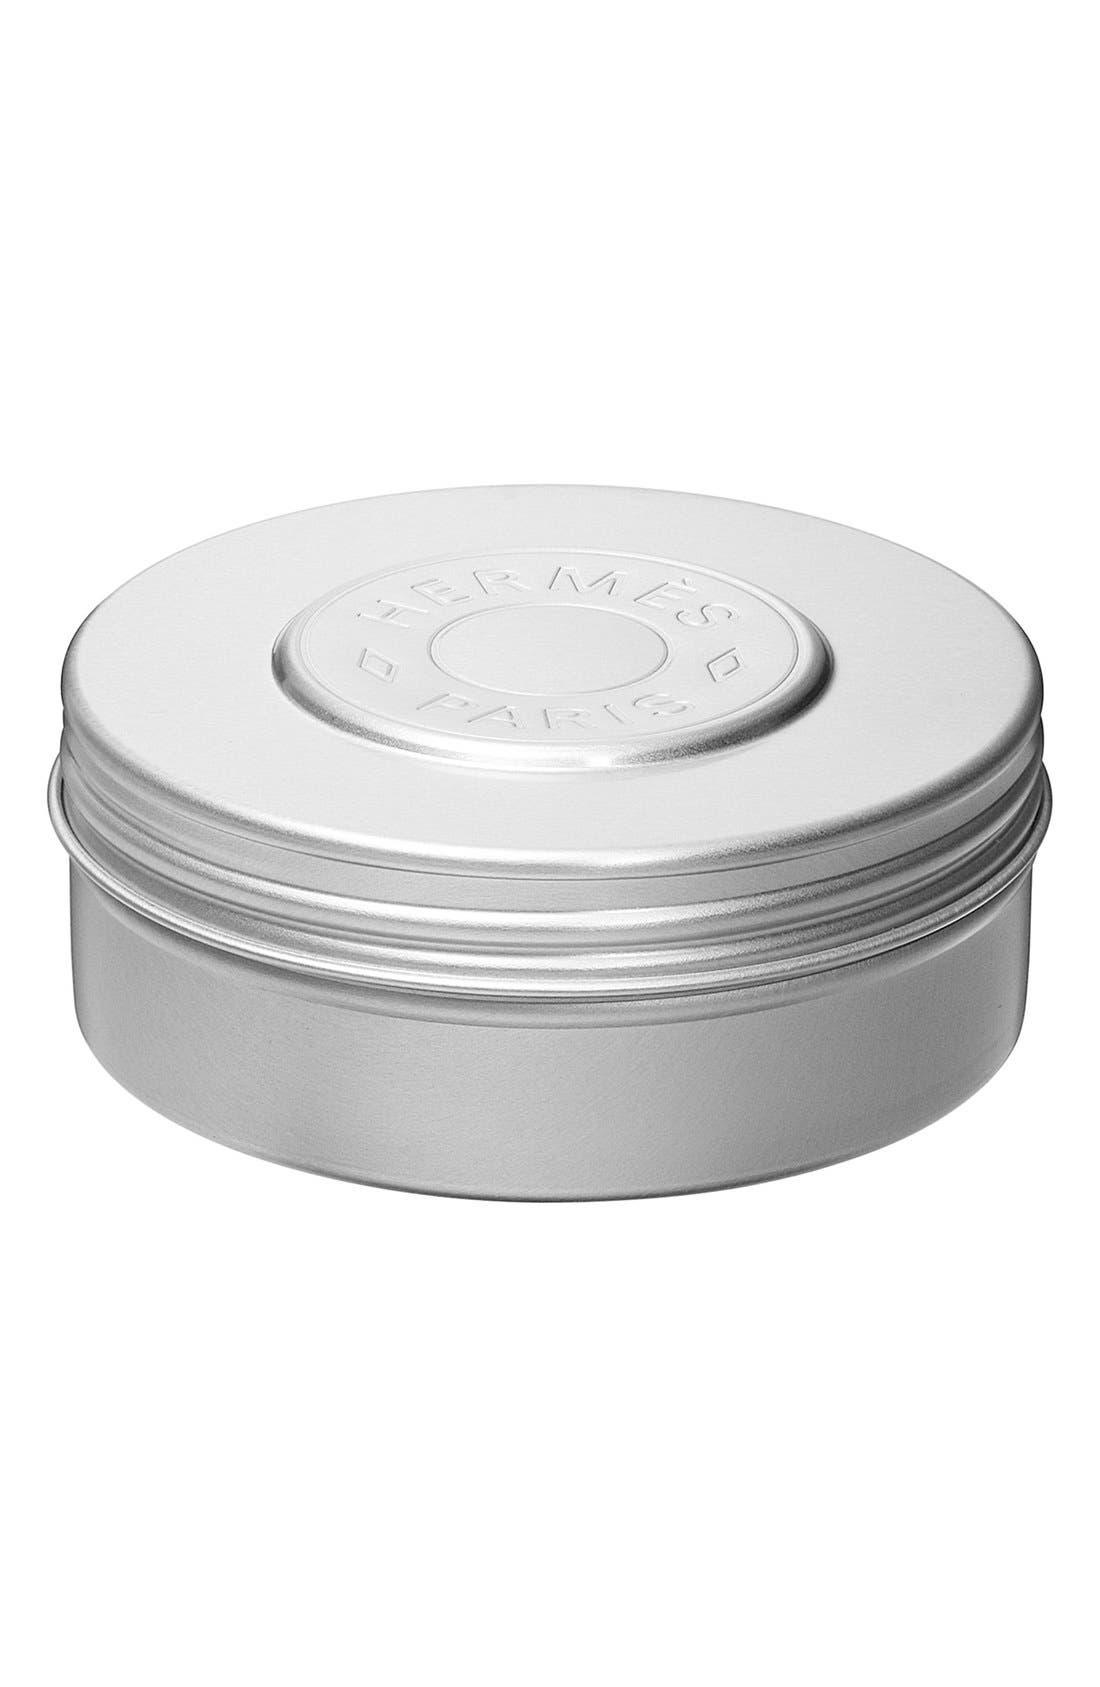 Hermès Eau de Néroli Doré - Face and body moisturizing balm